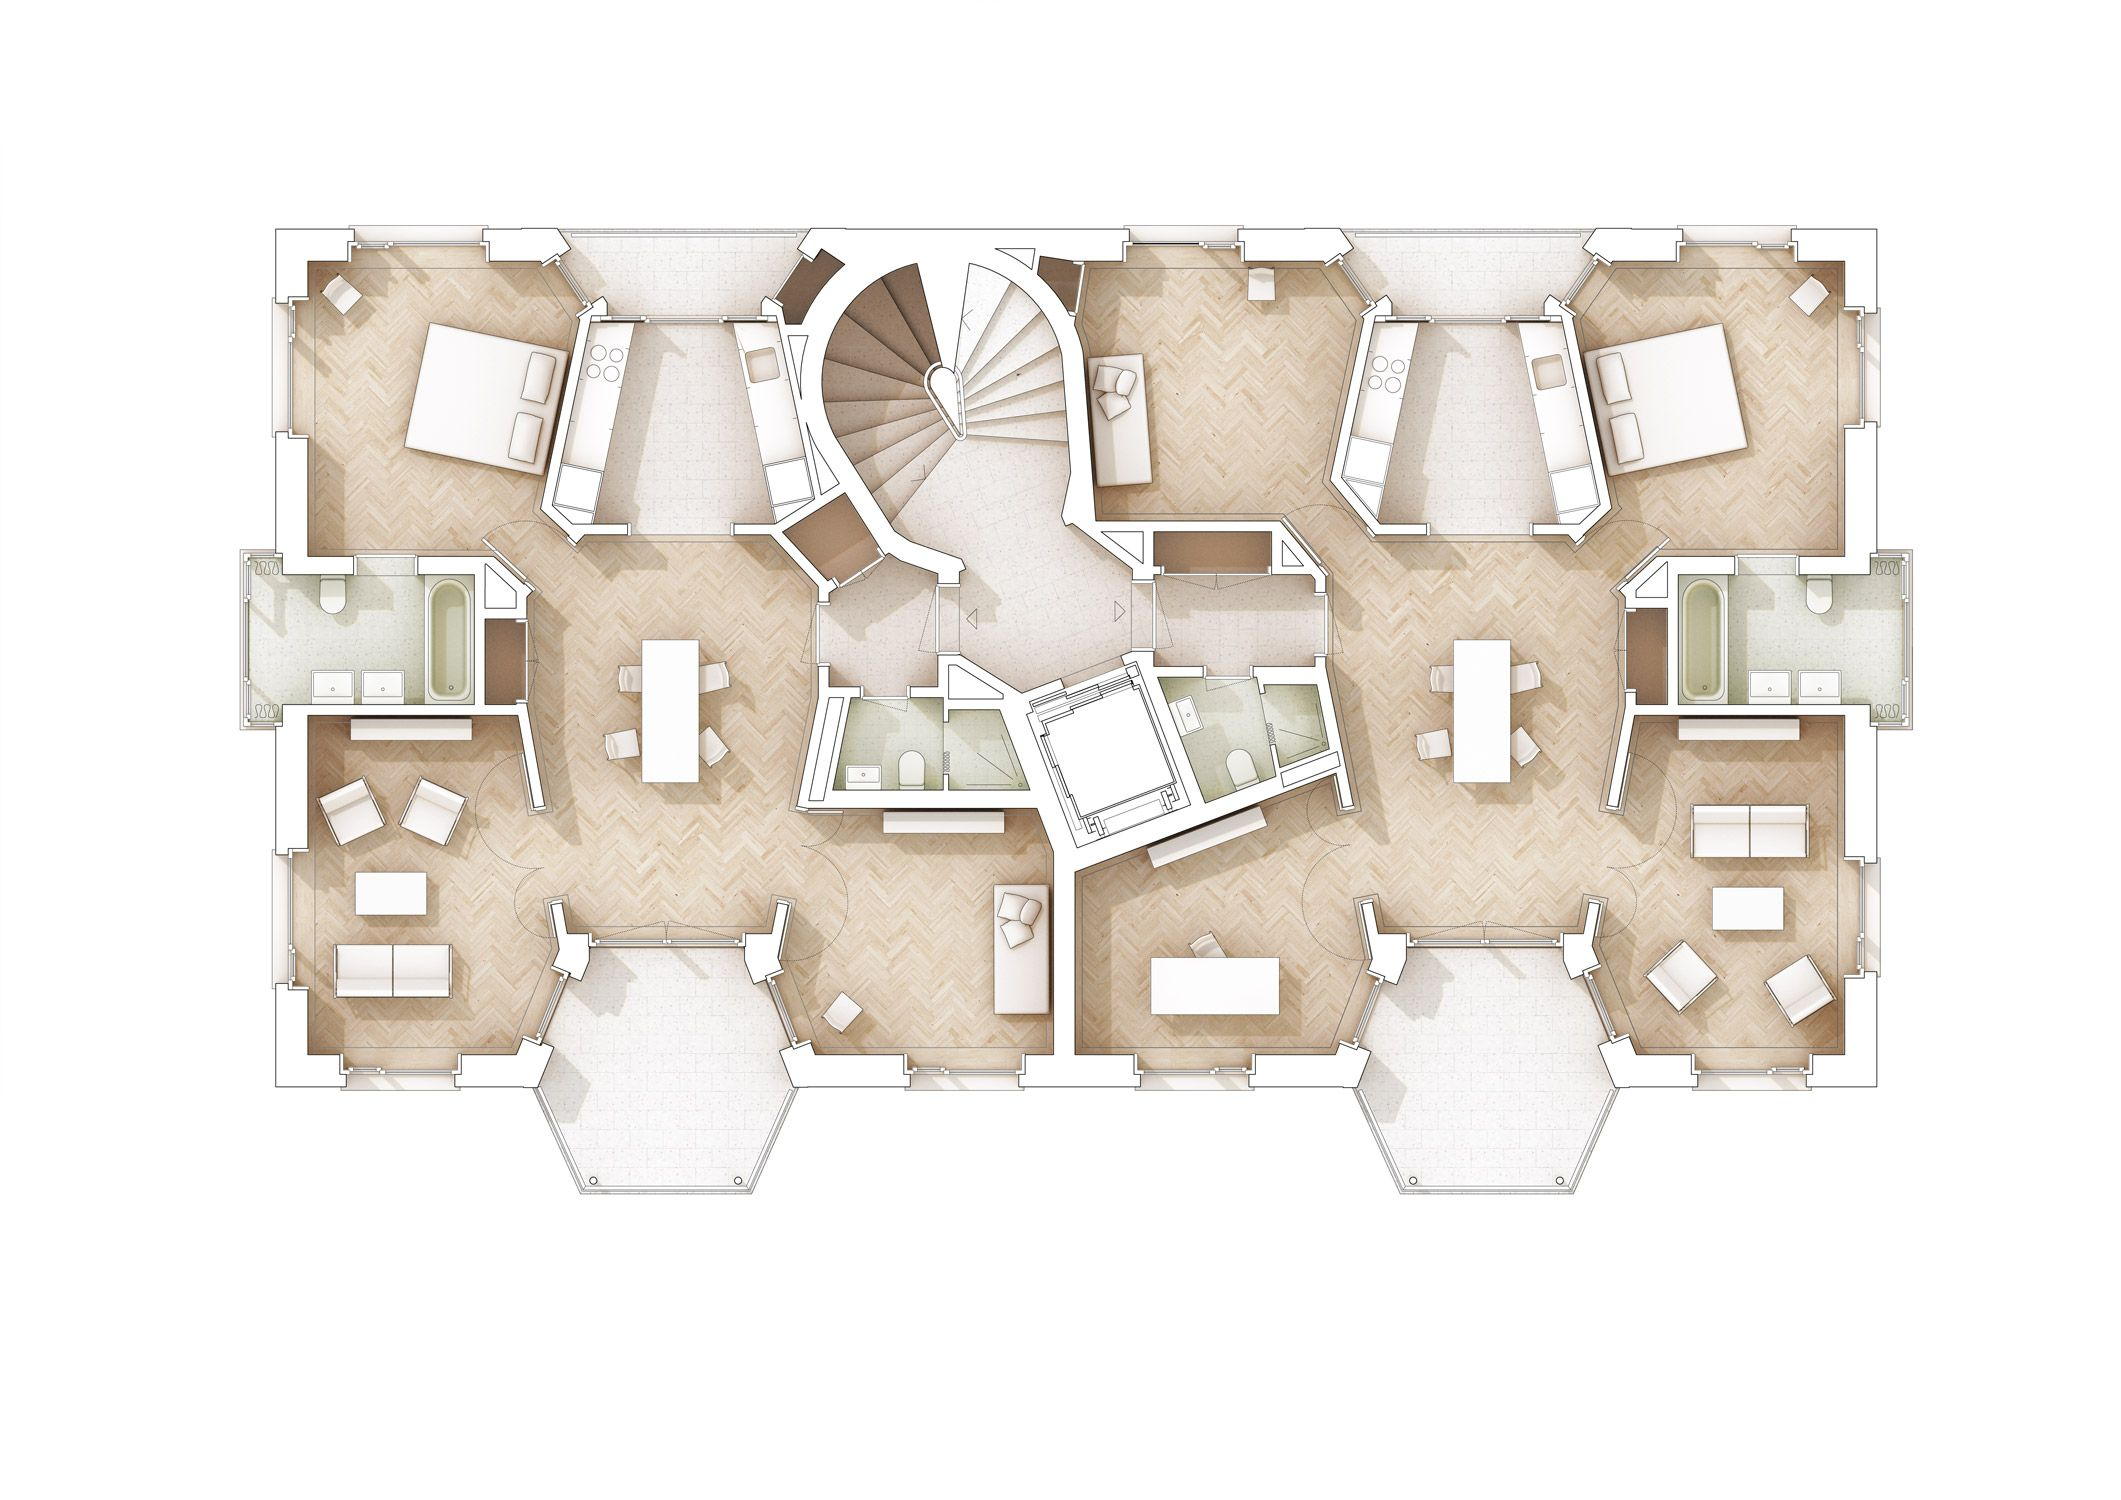 mehrgenerationenhaus 2 m t b ng nh pinterest architektur mehrgenerationenhaus v haus. Black Bedroom Furniture Sets. Home Design Ideas